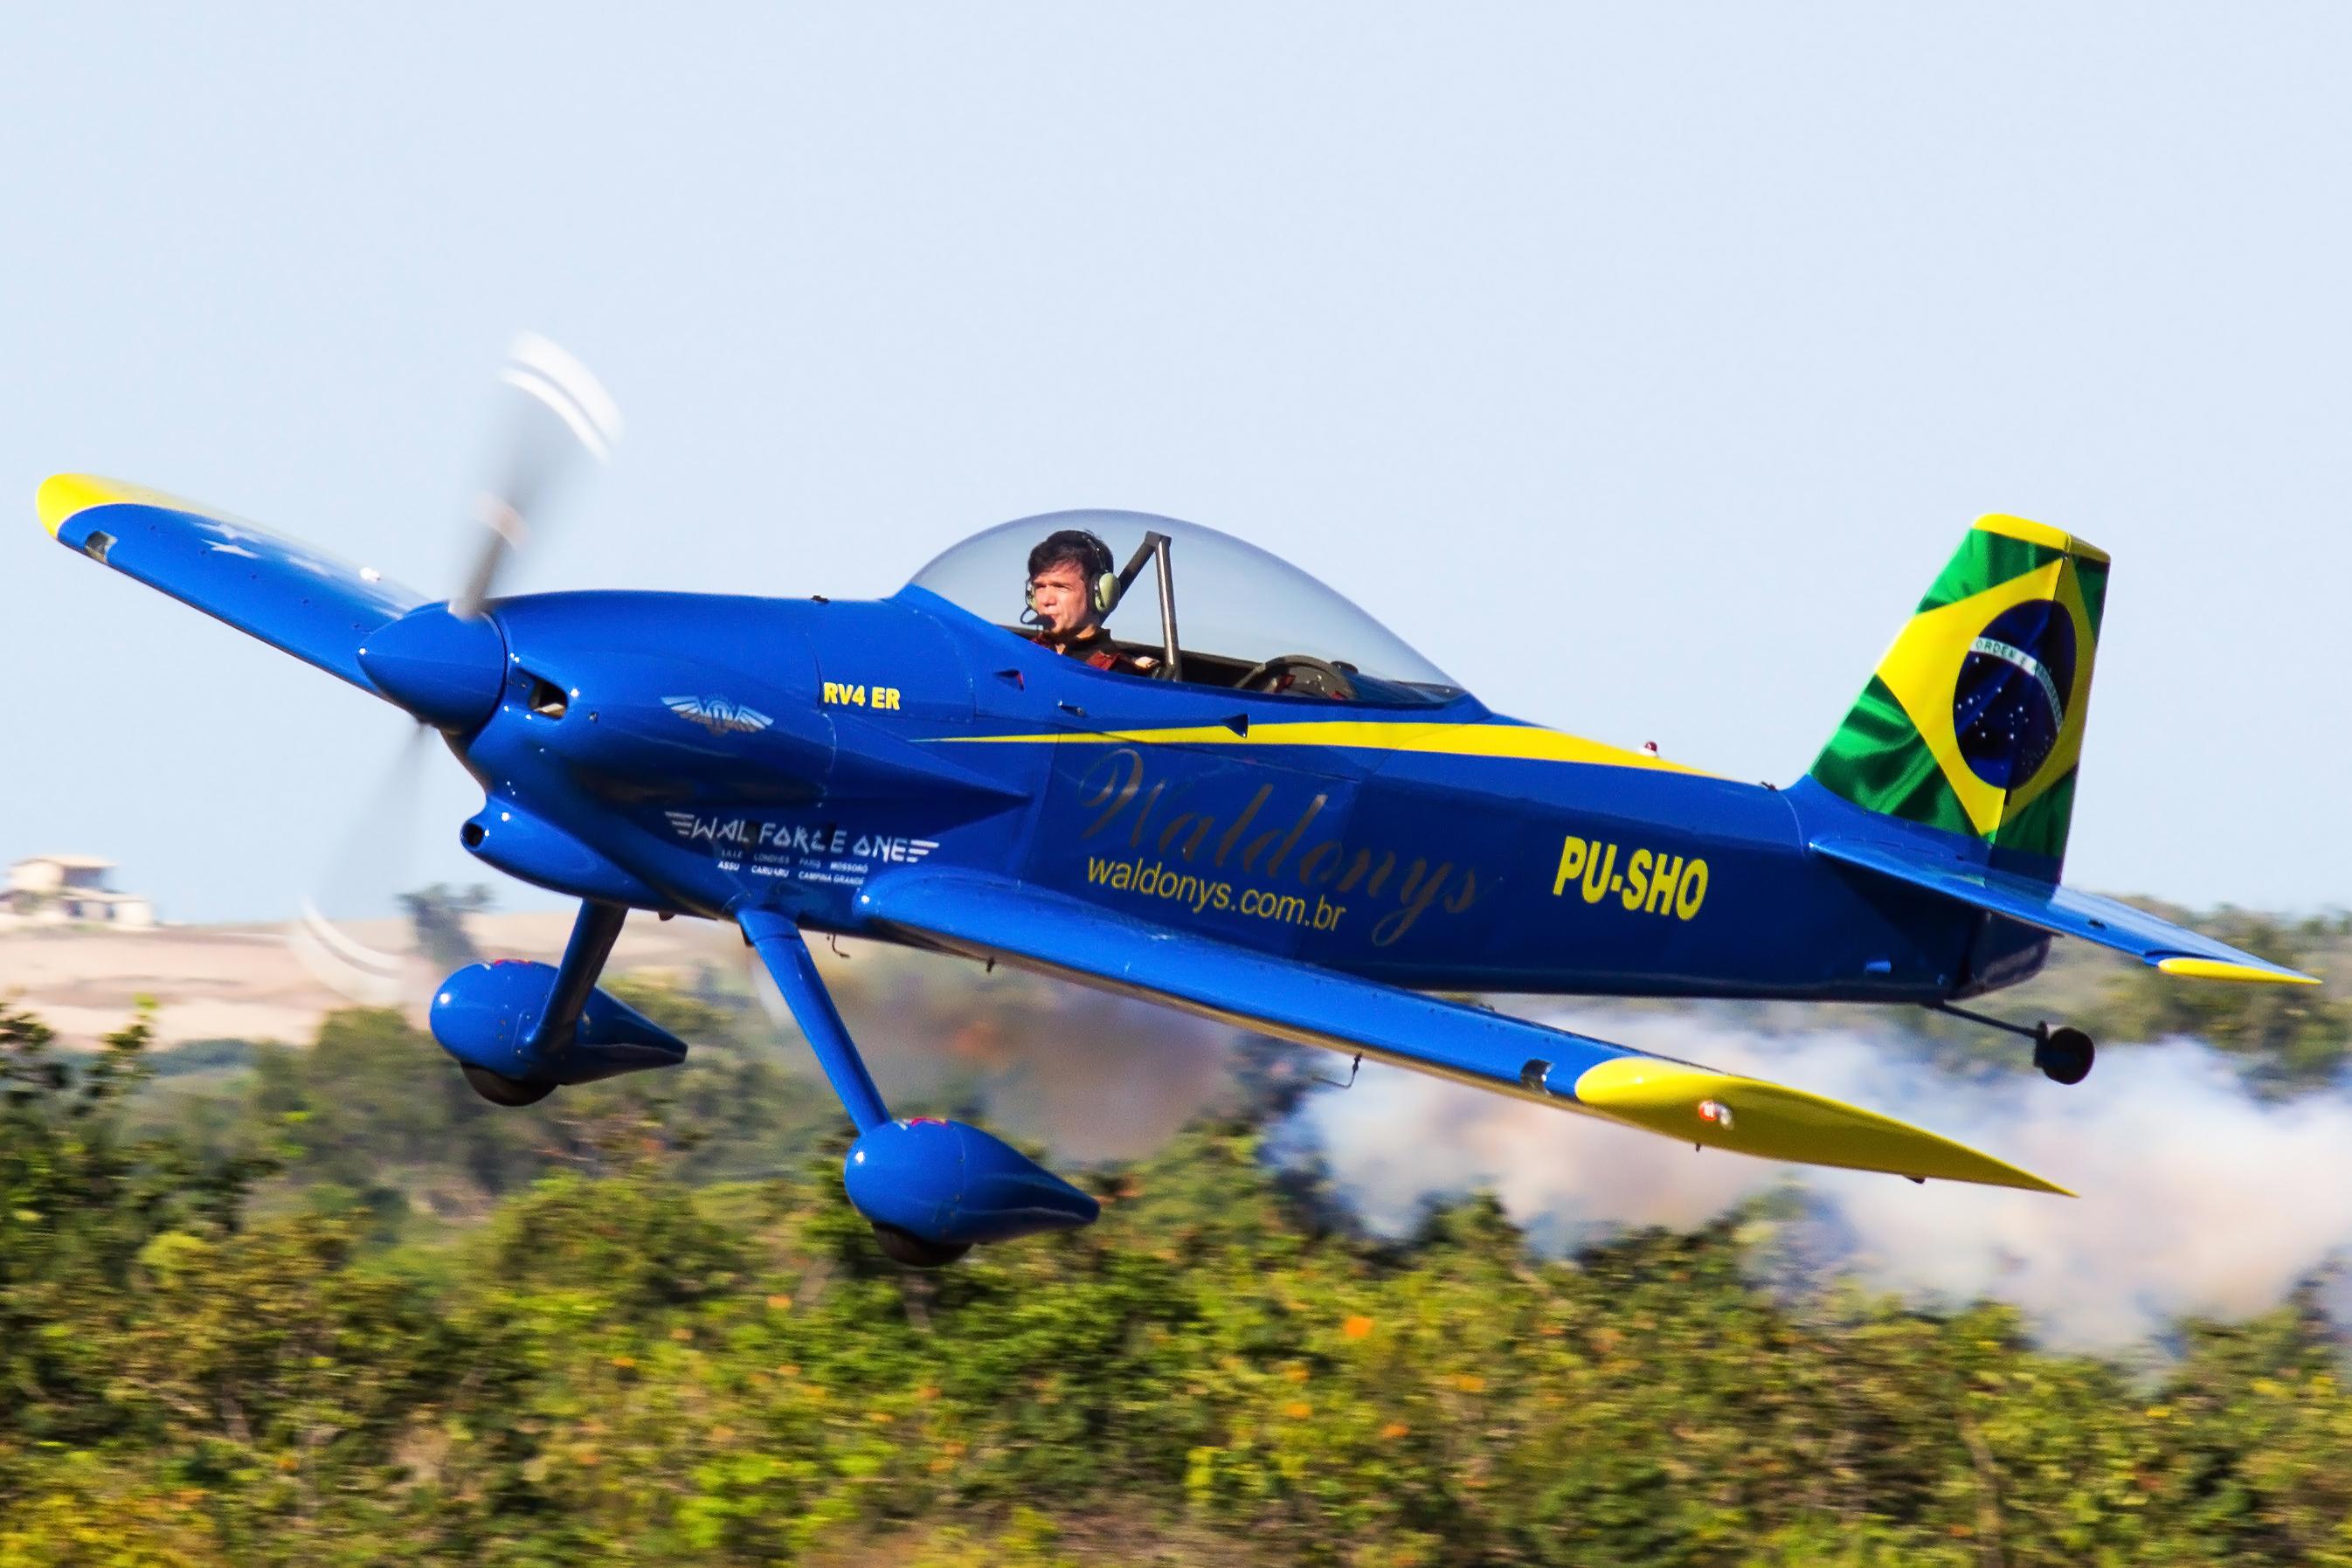 RN recebe 1º Encontro de Aeronaves do Brasil